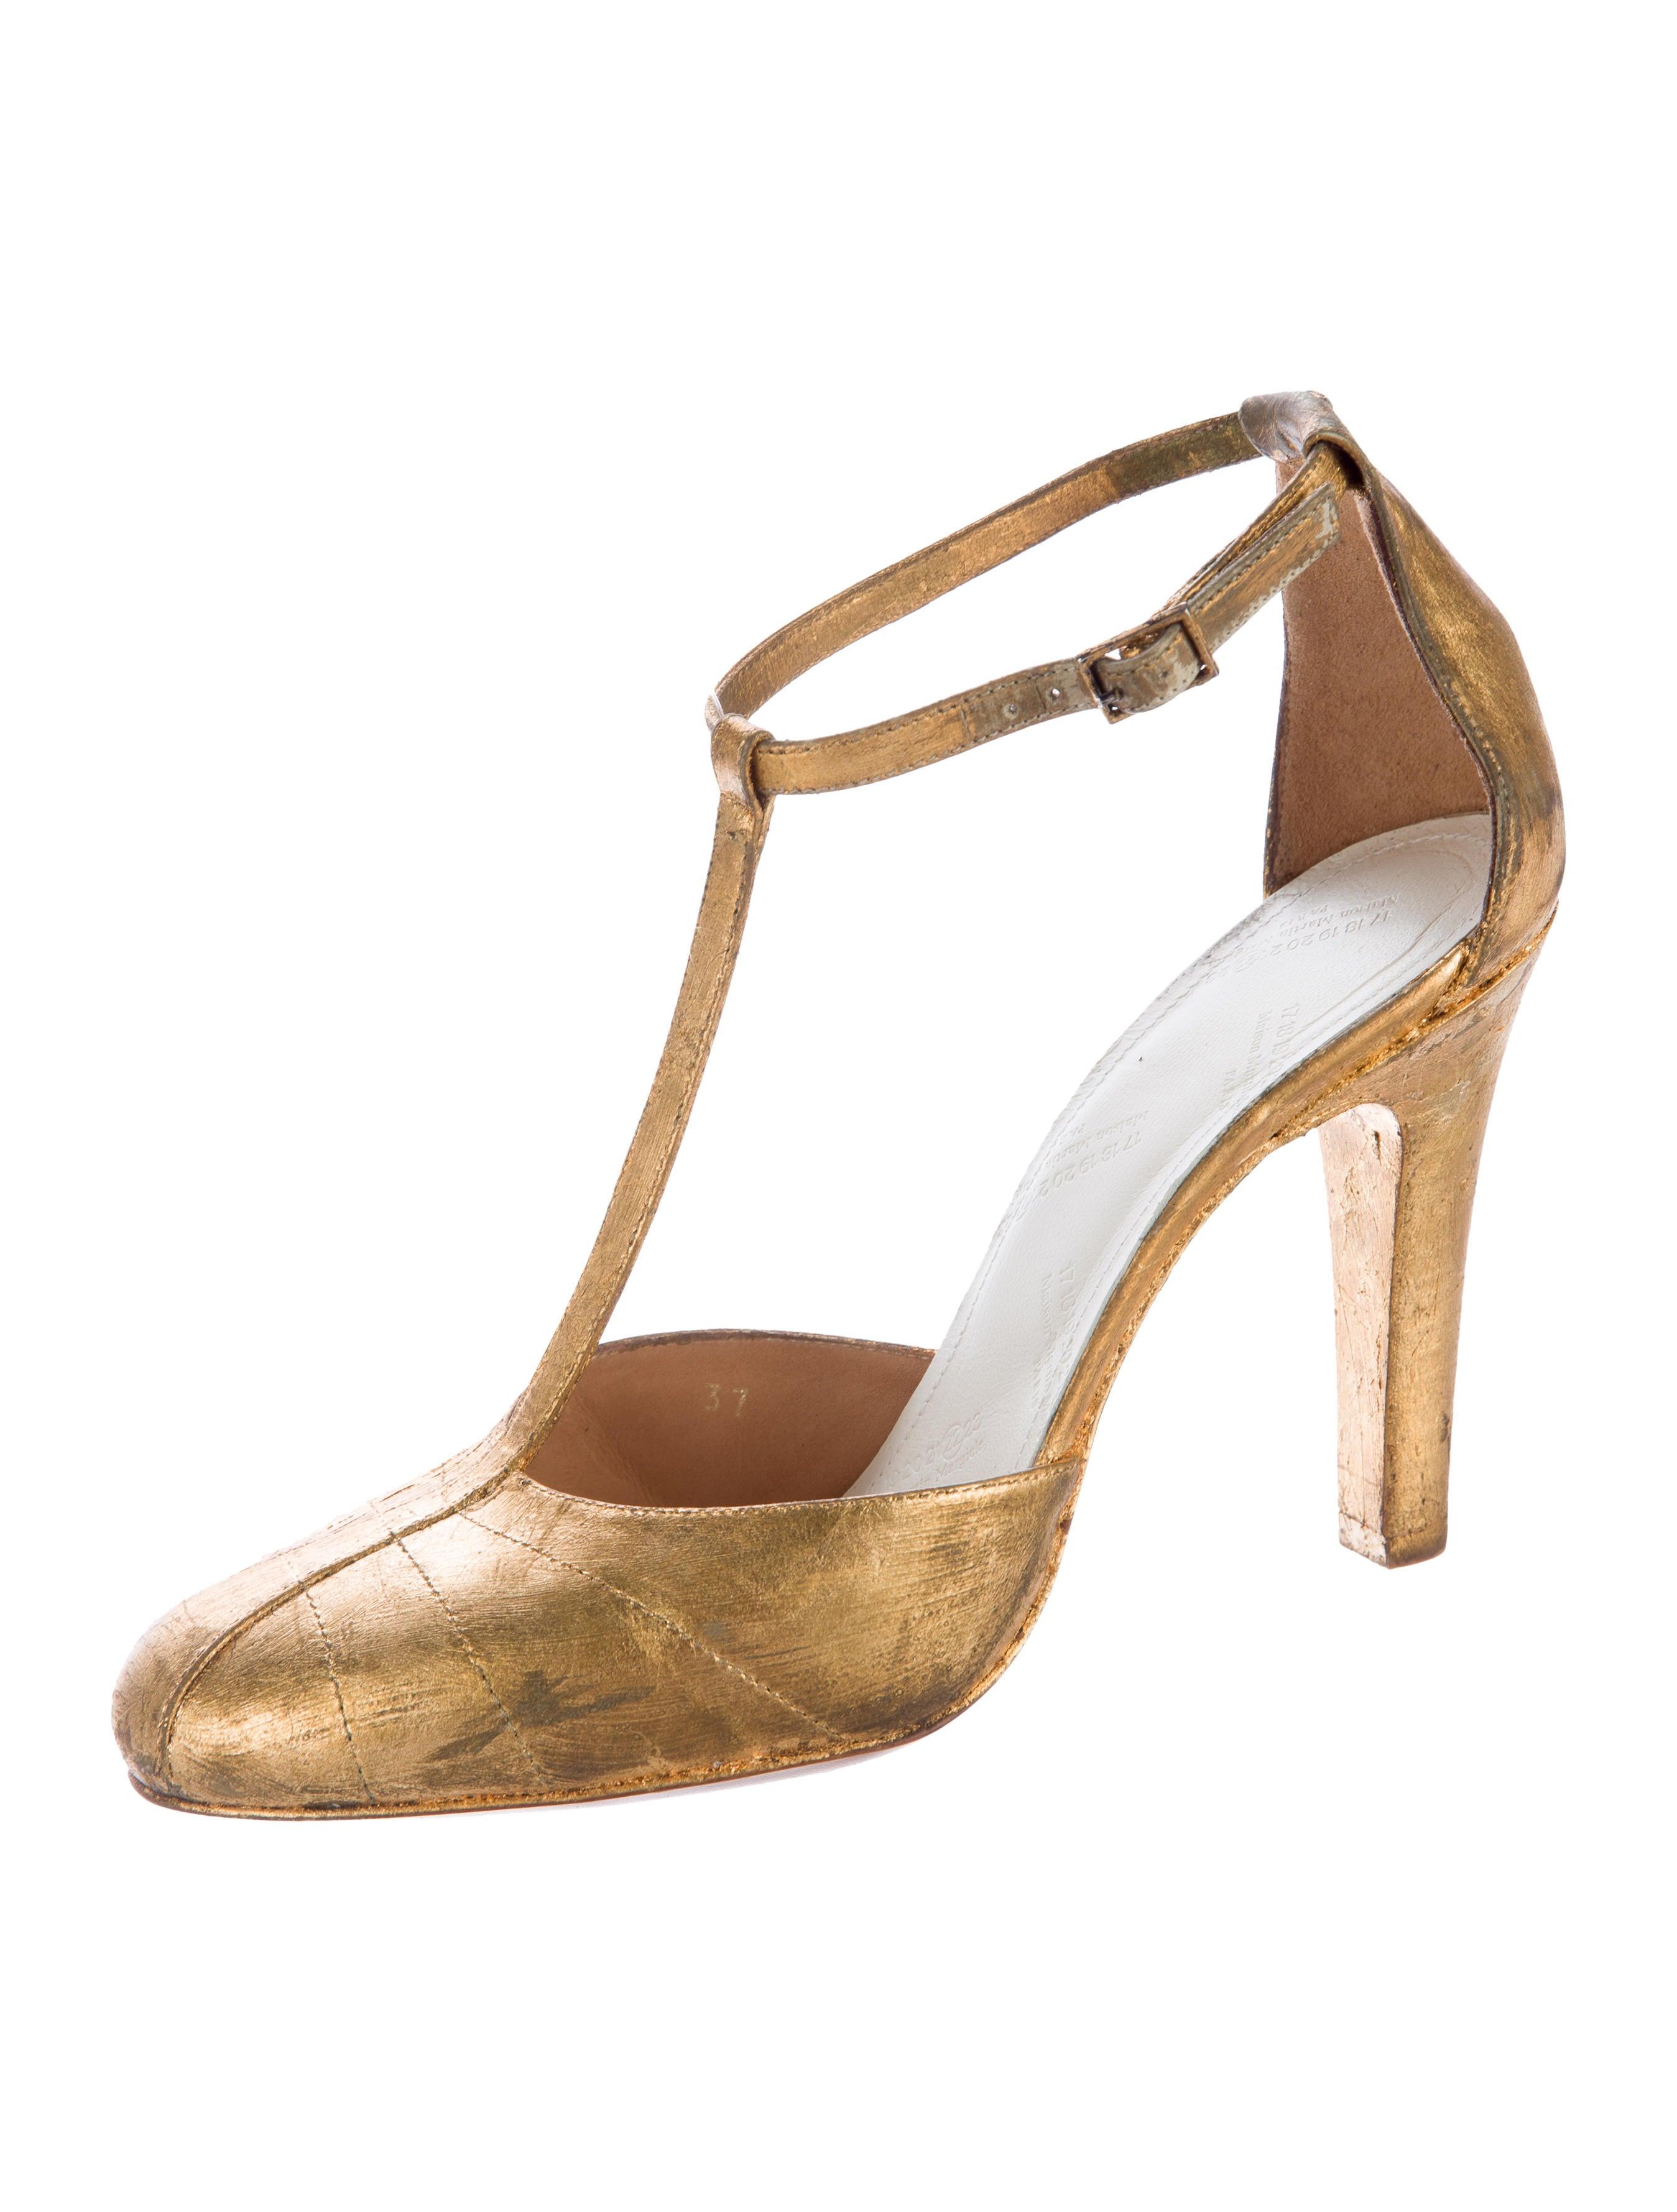 maison margiela metallic t strap pumps shoes mai29079 the realreal. Black Bedroom Furniture Sets. Home Design Ideas